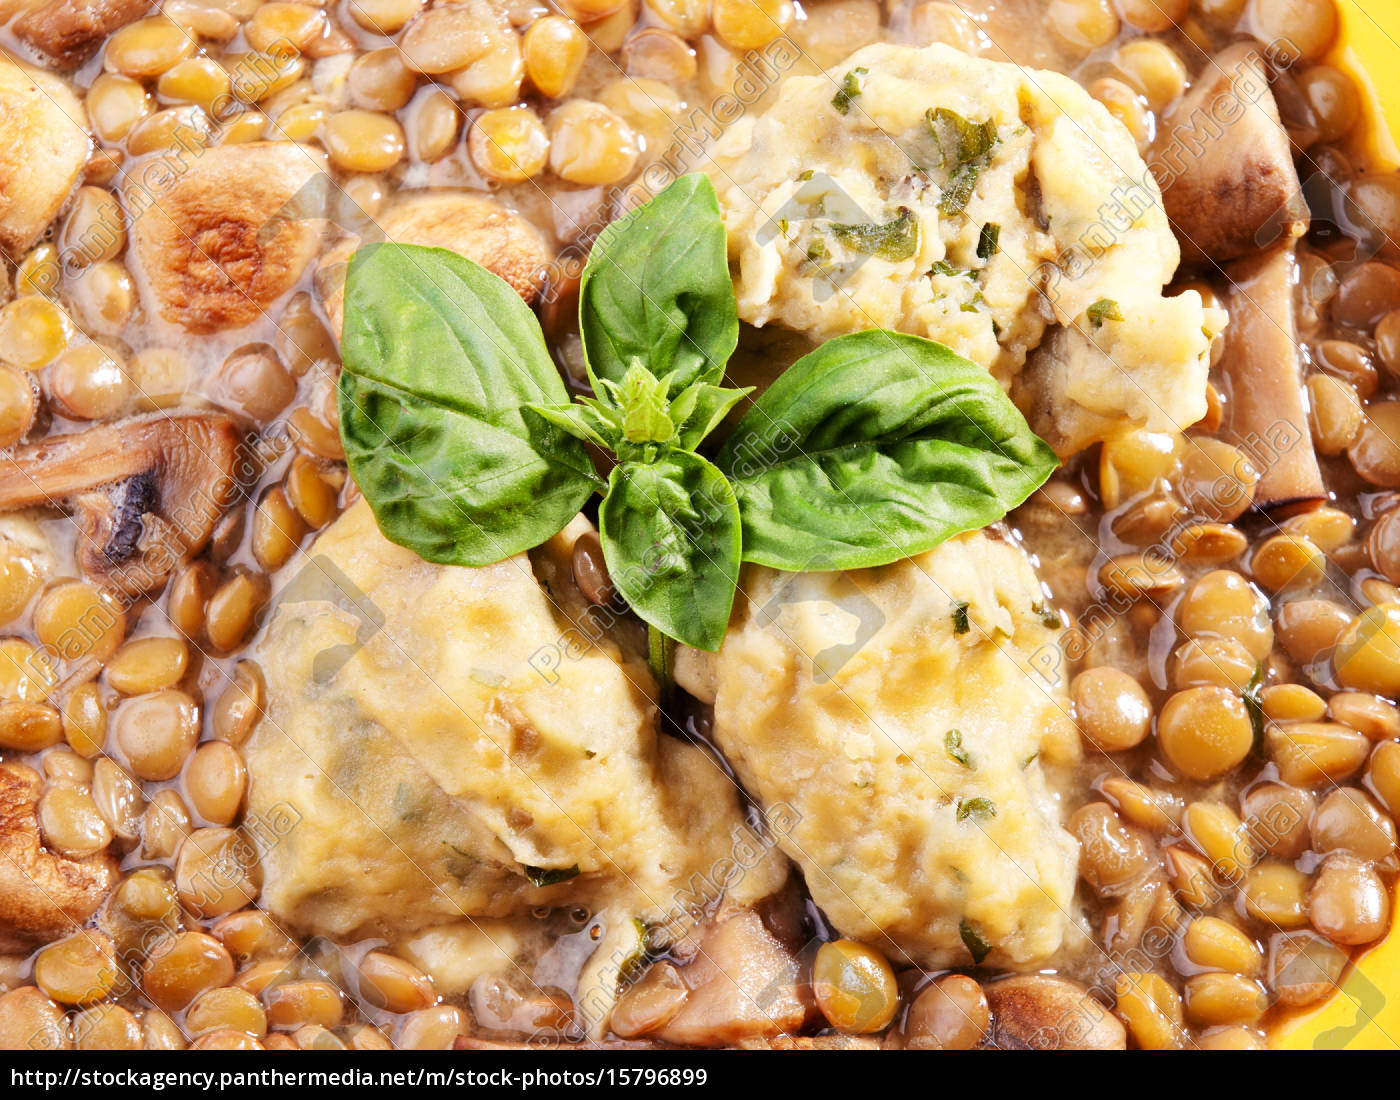 lentil, soup, lentil, soup, lentil, soup, lentil, soup, lentil, soup, lentil - 15796899